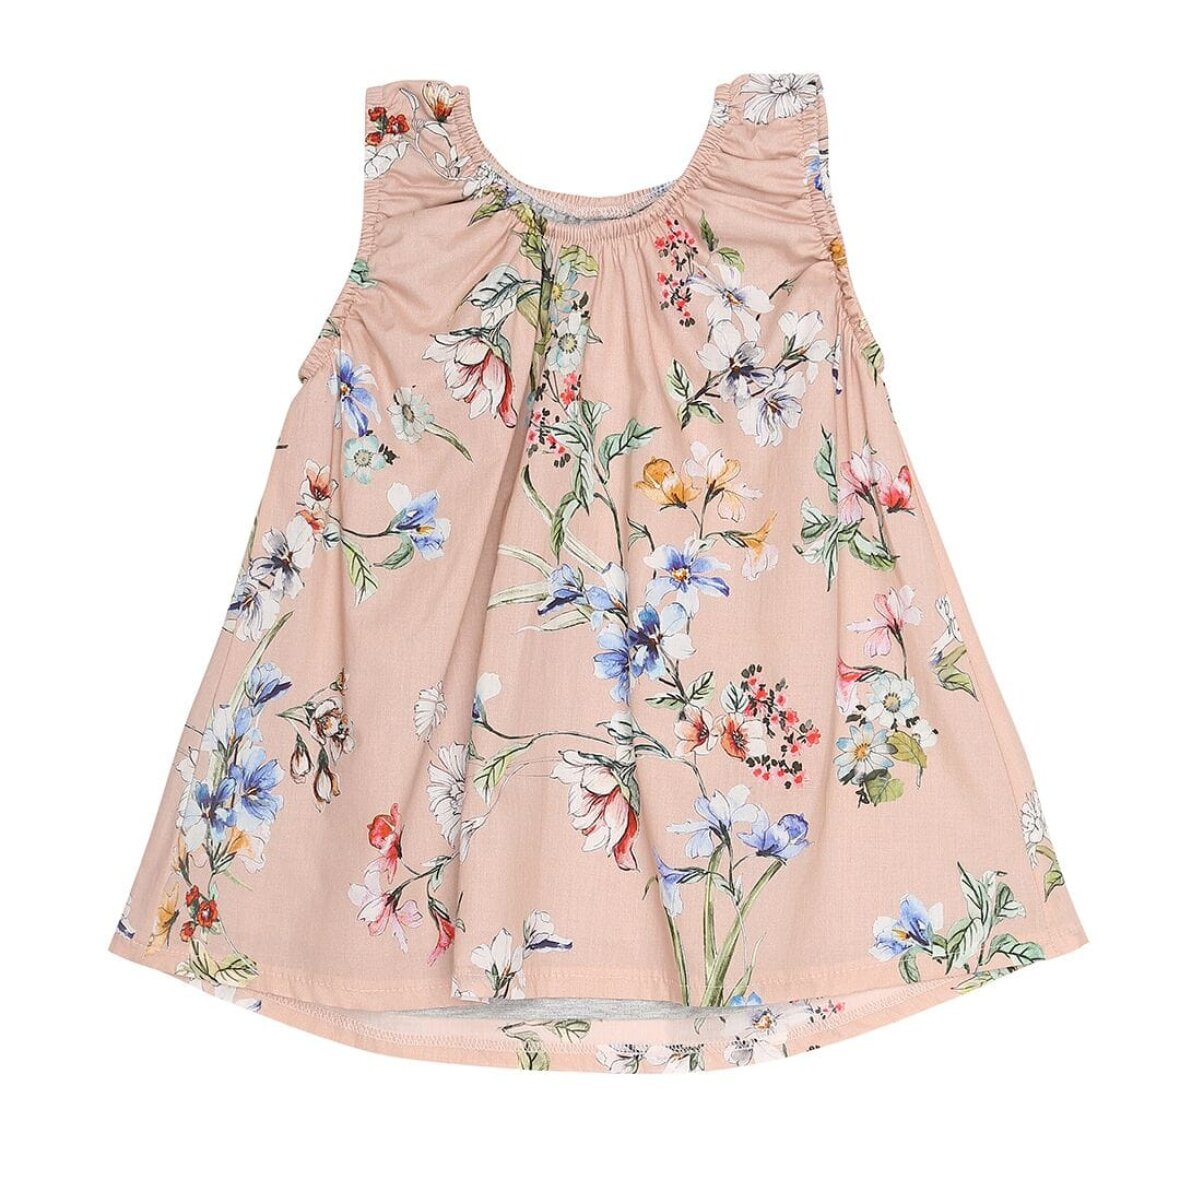 3bfea46a5999 Lyserød baby kjole fra Christina Rohde - Skruuk